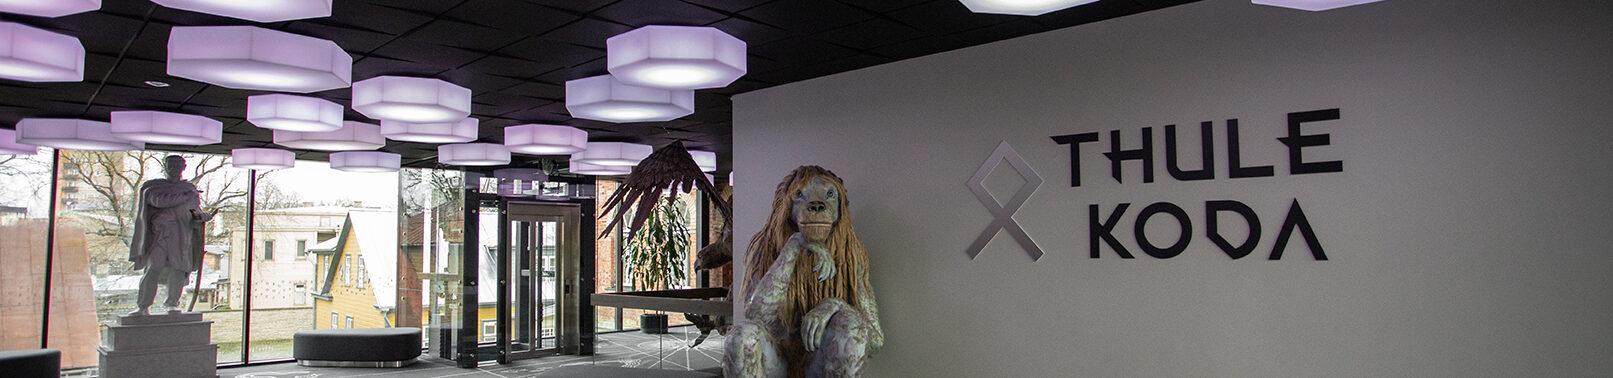 Thule Koda muuseum